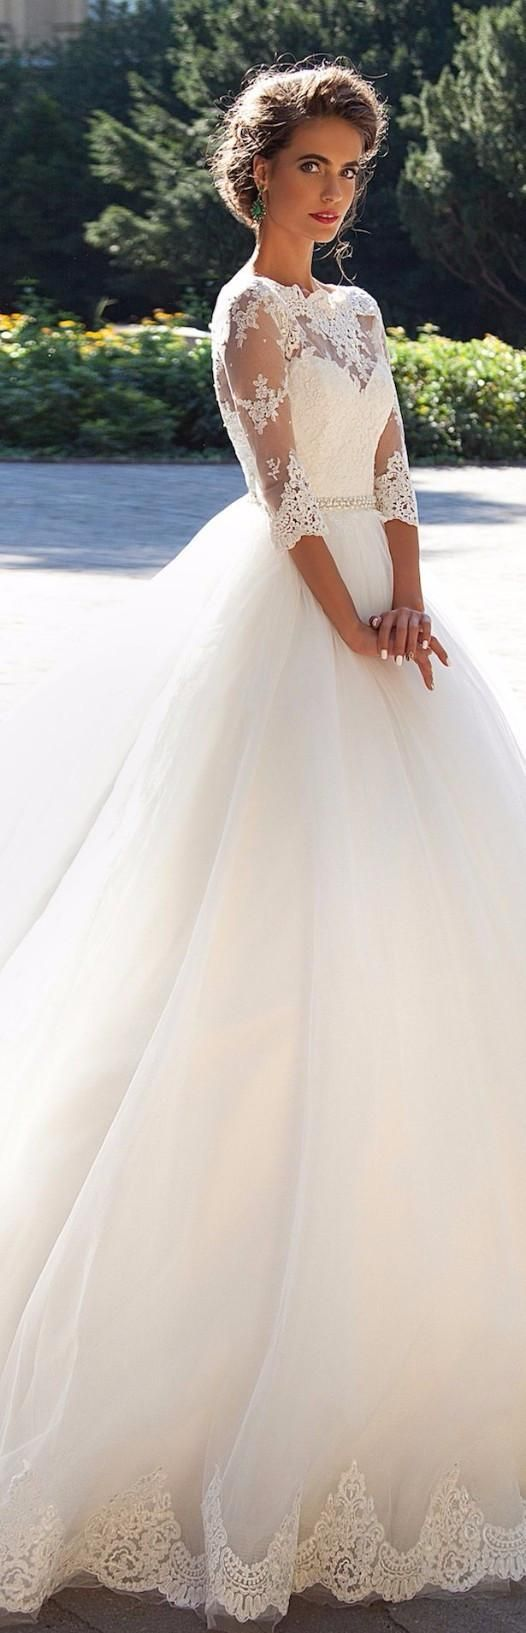 Vestido de noiva princesa. Vote no seu preferido! 5